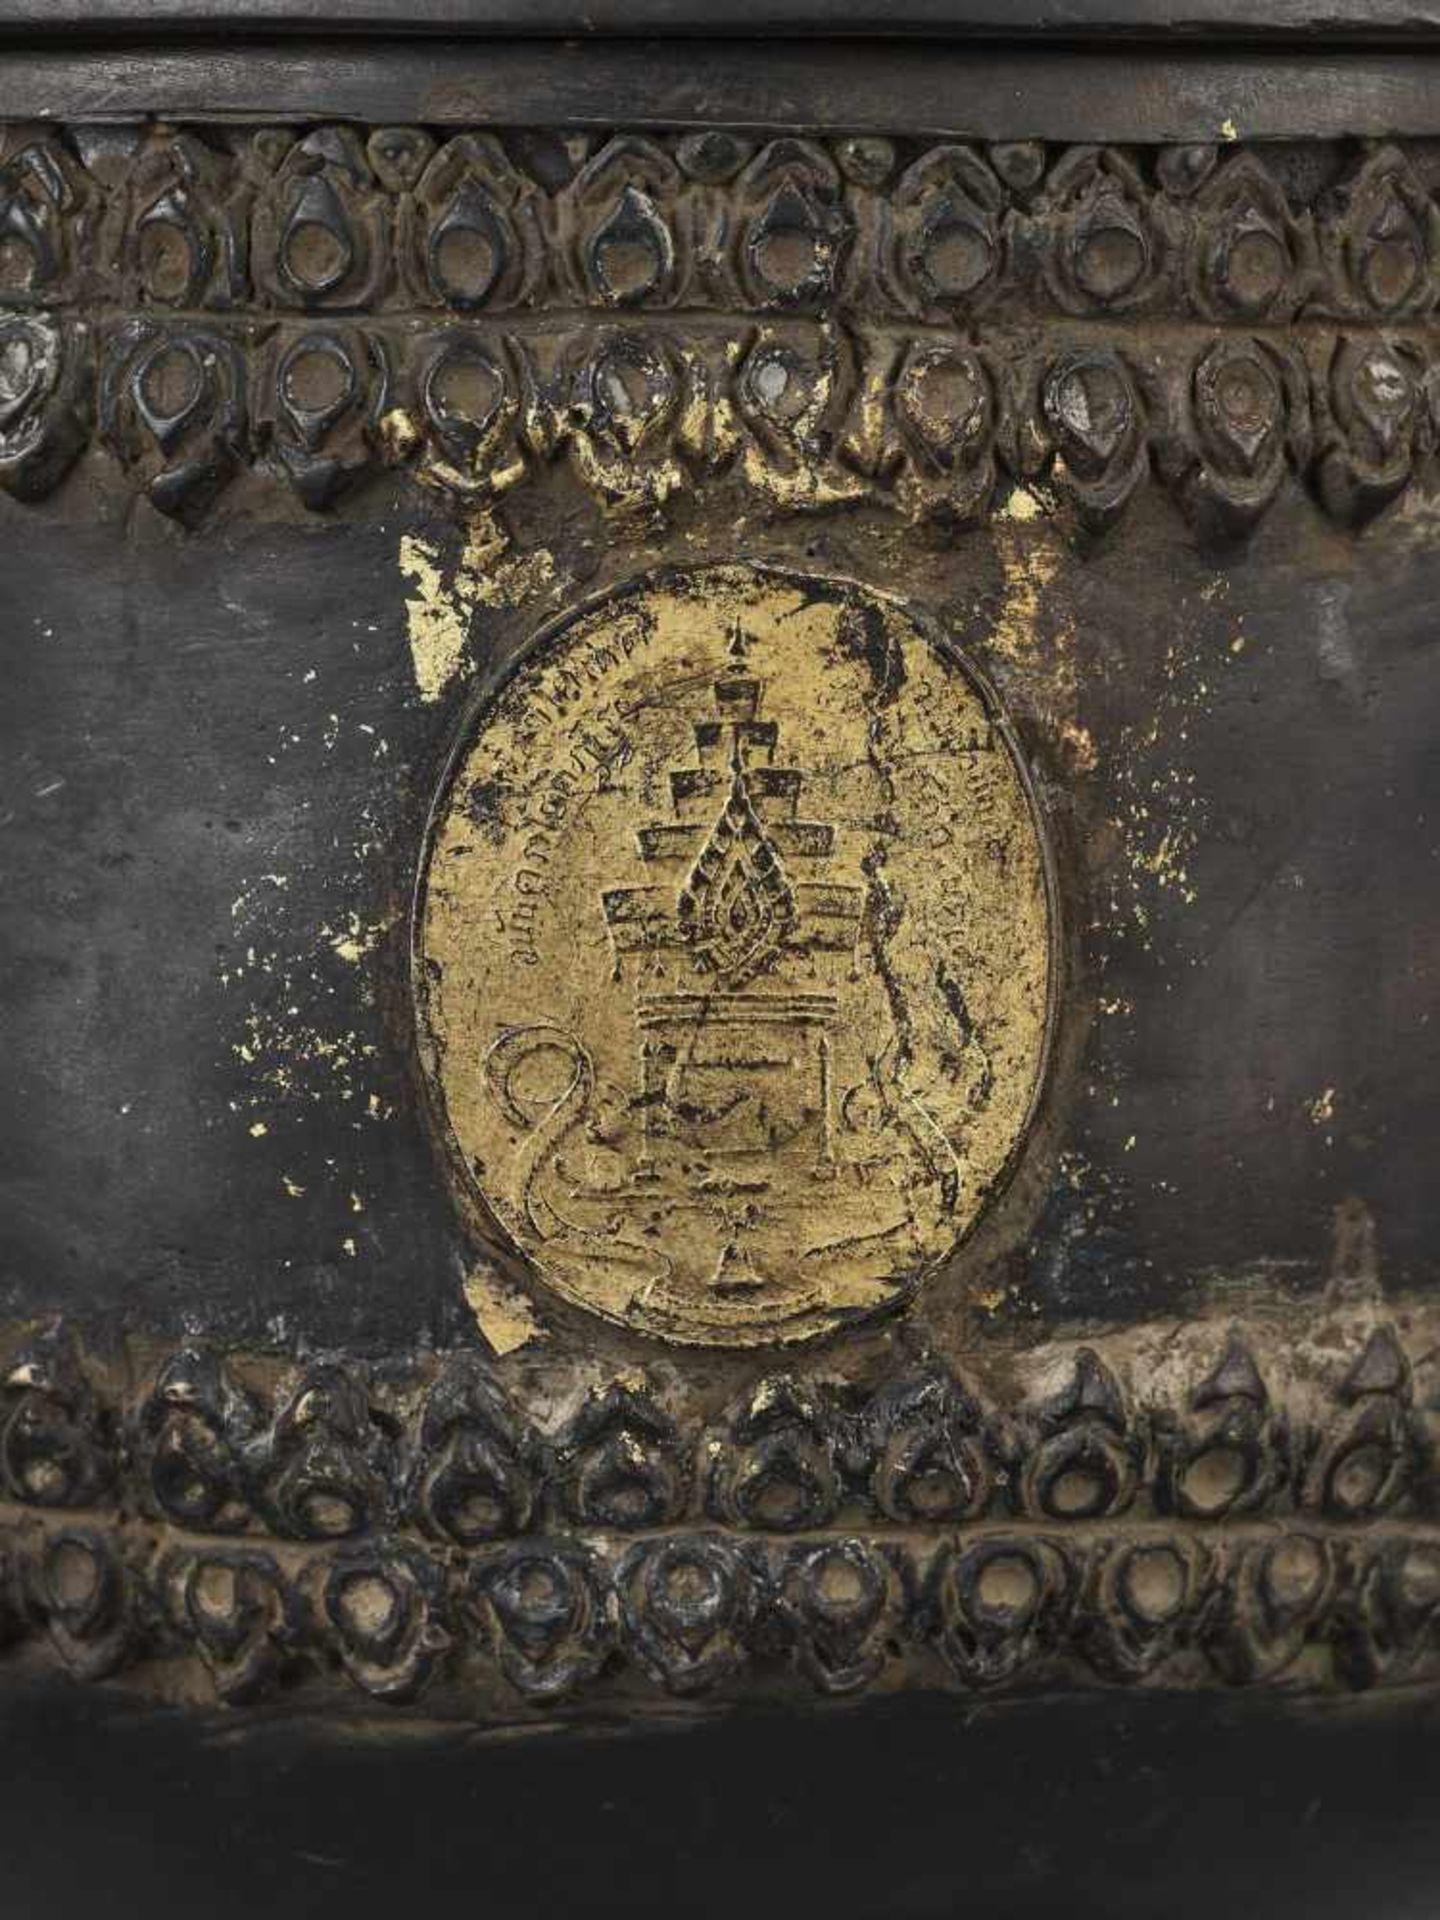 A CHAM PARCEL-GILT BRONZE VESSEL AND COVER WITH BUDDHA SHAKYAMUNI - Bild 4 aus 11